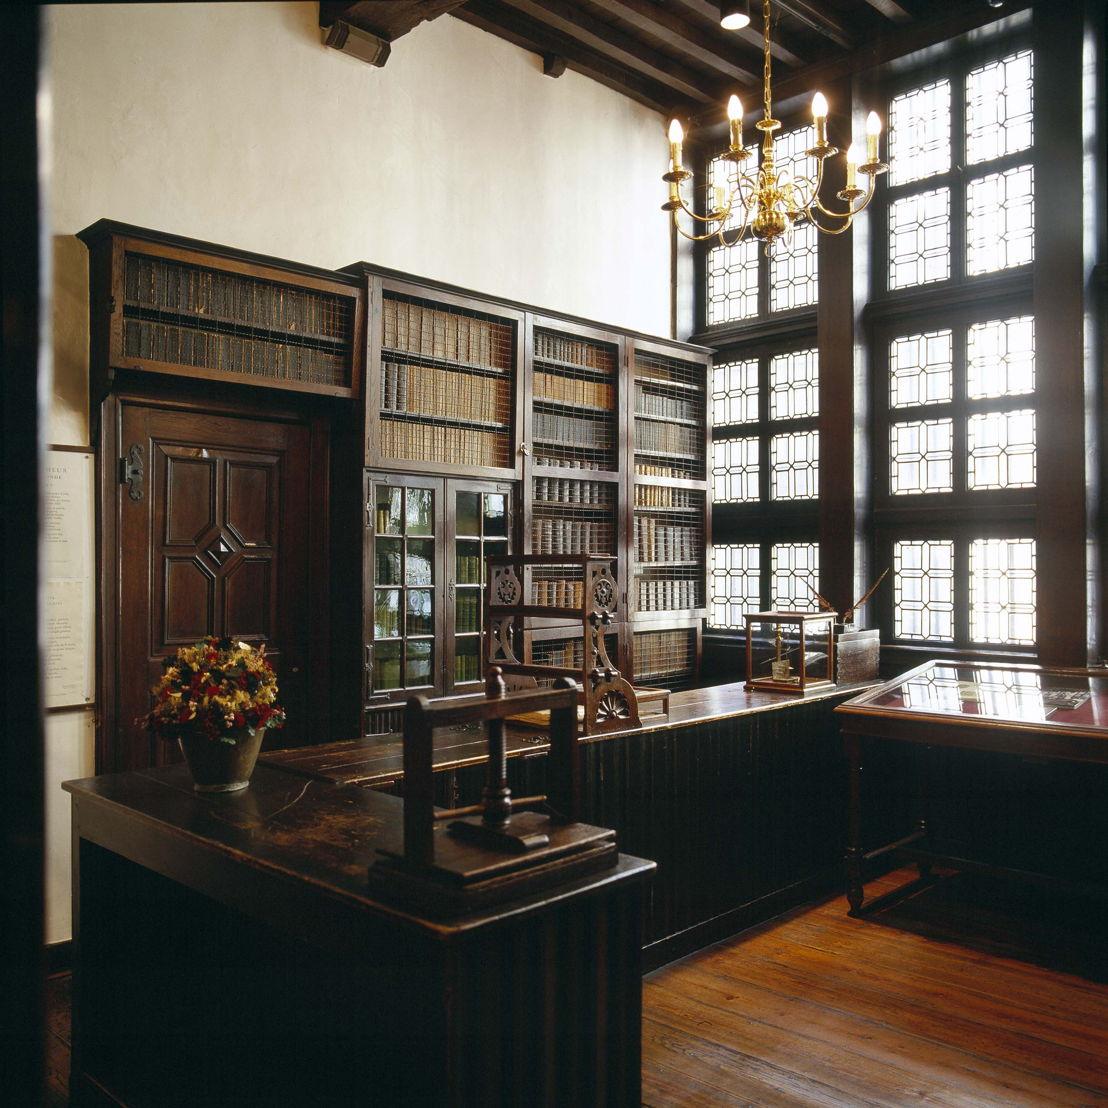 Museum Plantin-Moretus, old bookshop (ca. 1630), photo: Joris Luyten